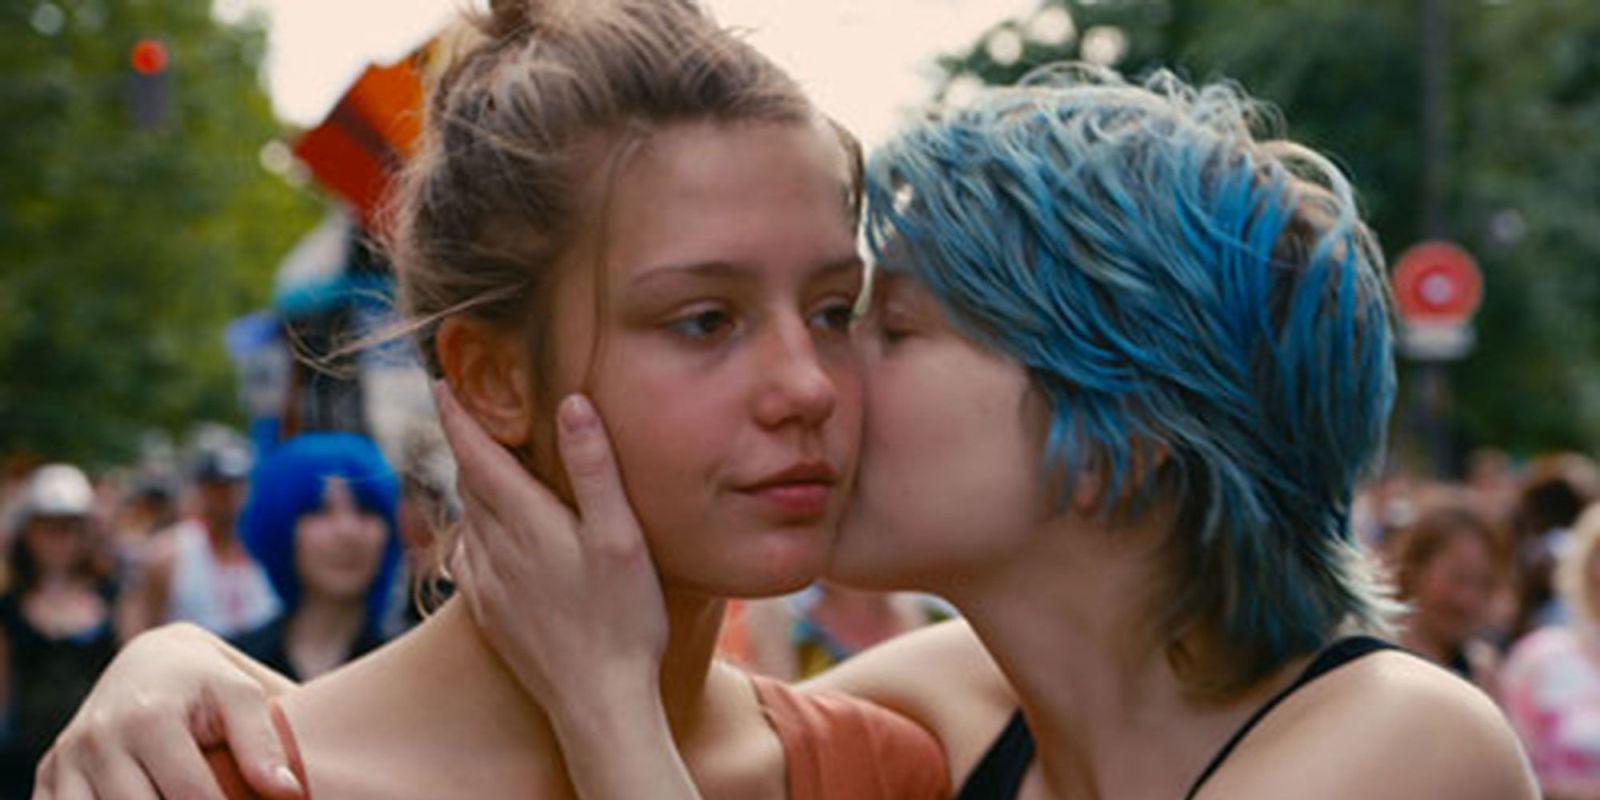 Глядя фильмы на лесбийскую тематику